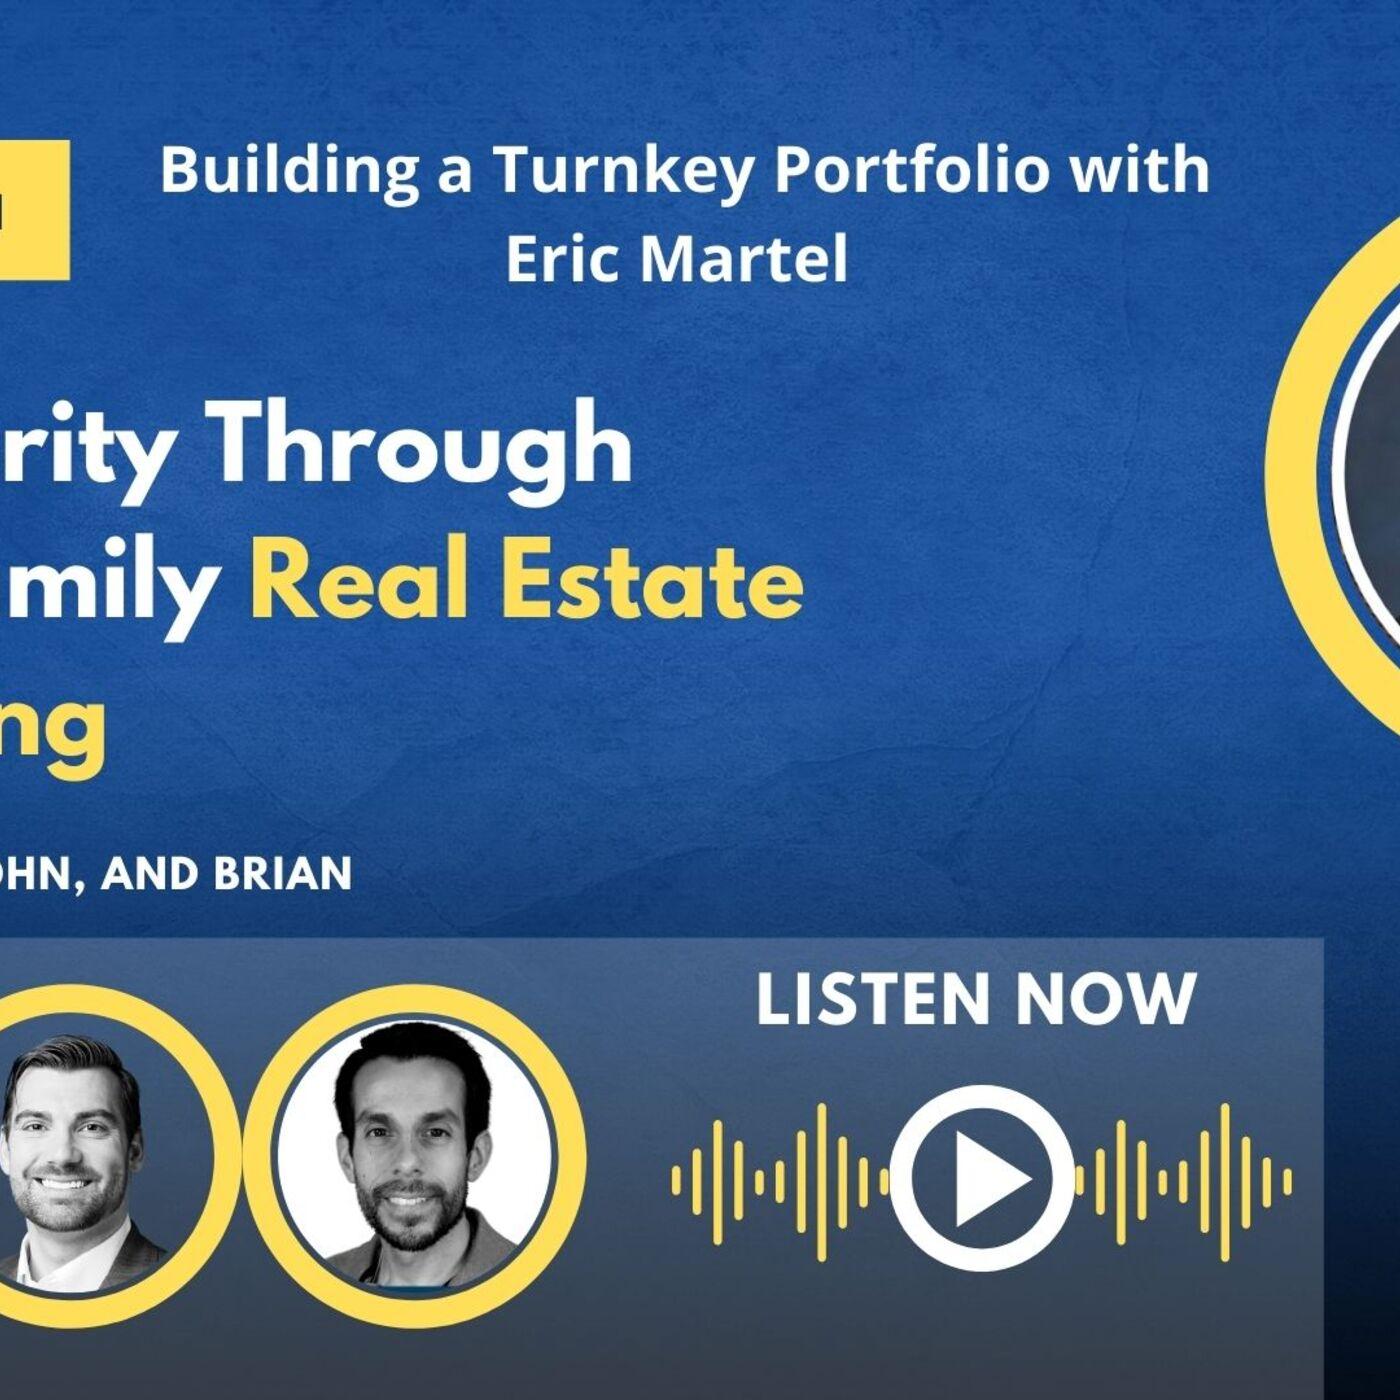 Building a Turnkey Portfolio with Eric Martel